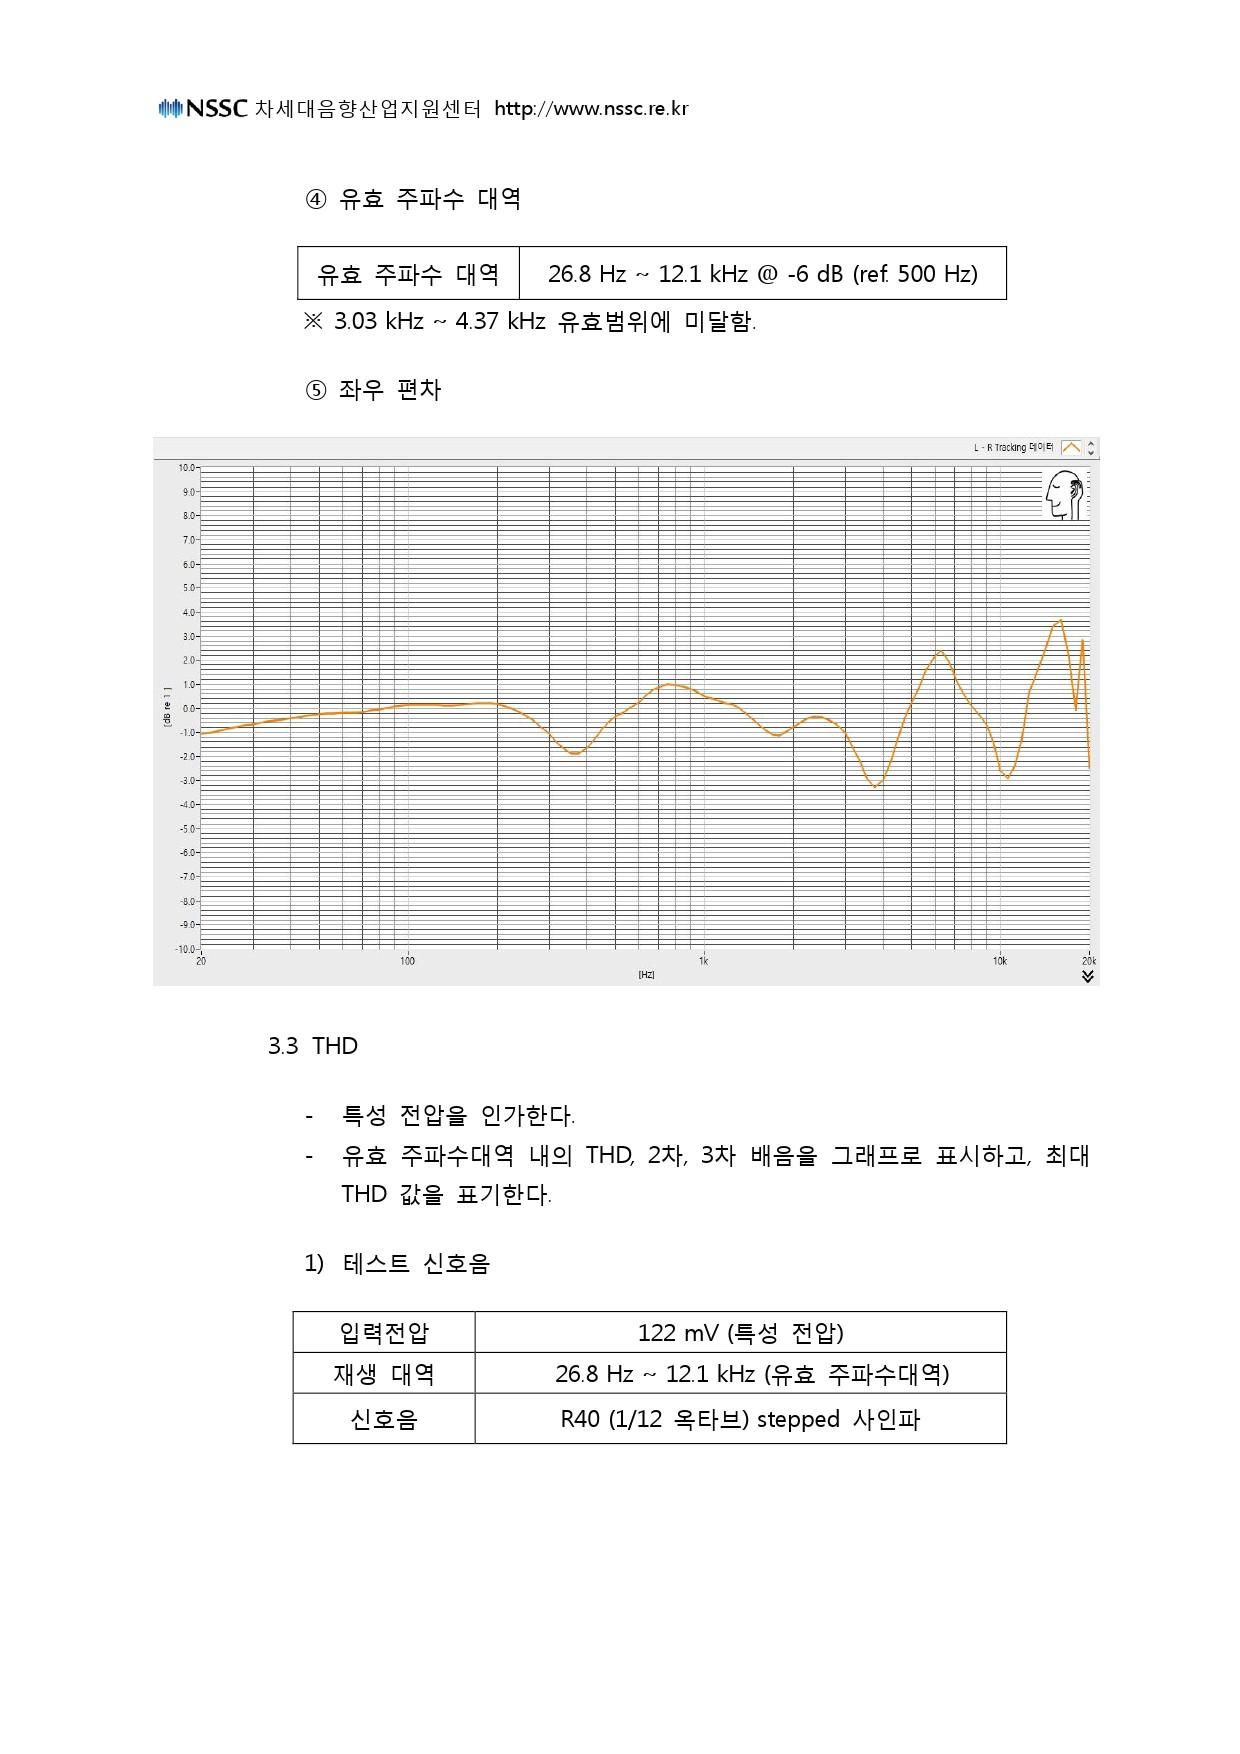 Audio-technica-MSR7-6.jpg